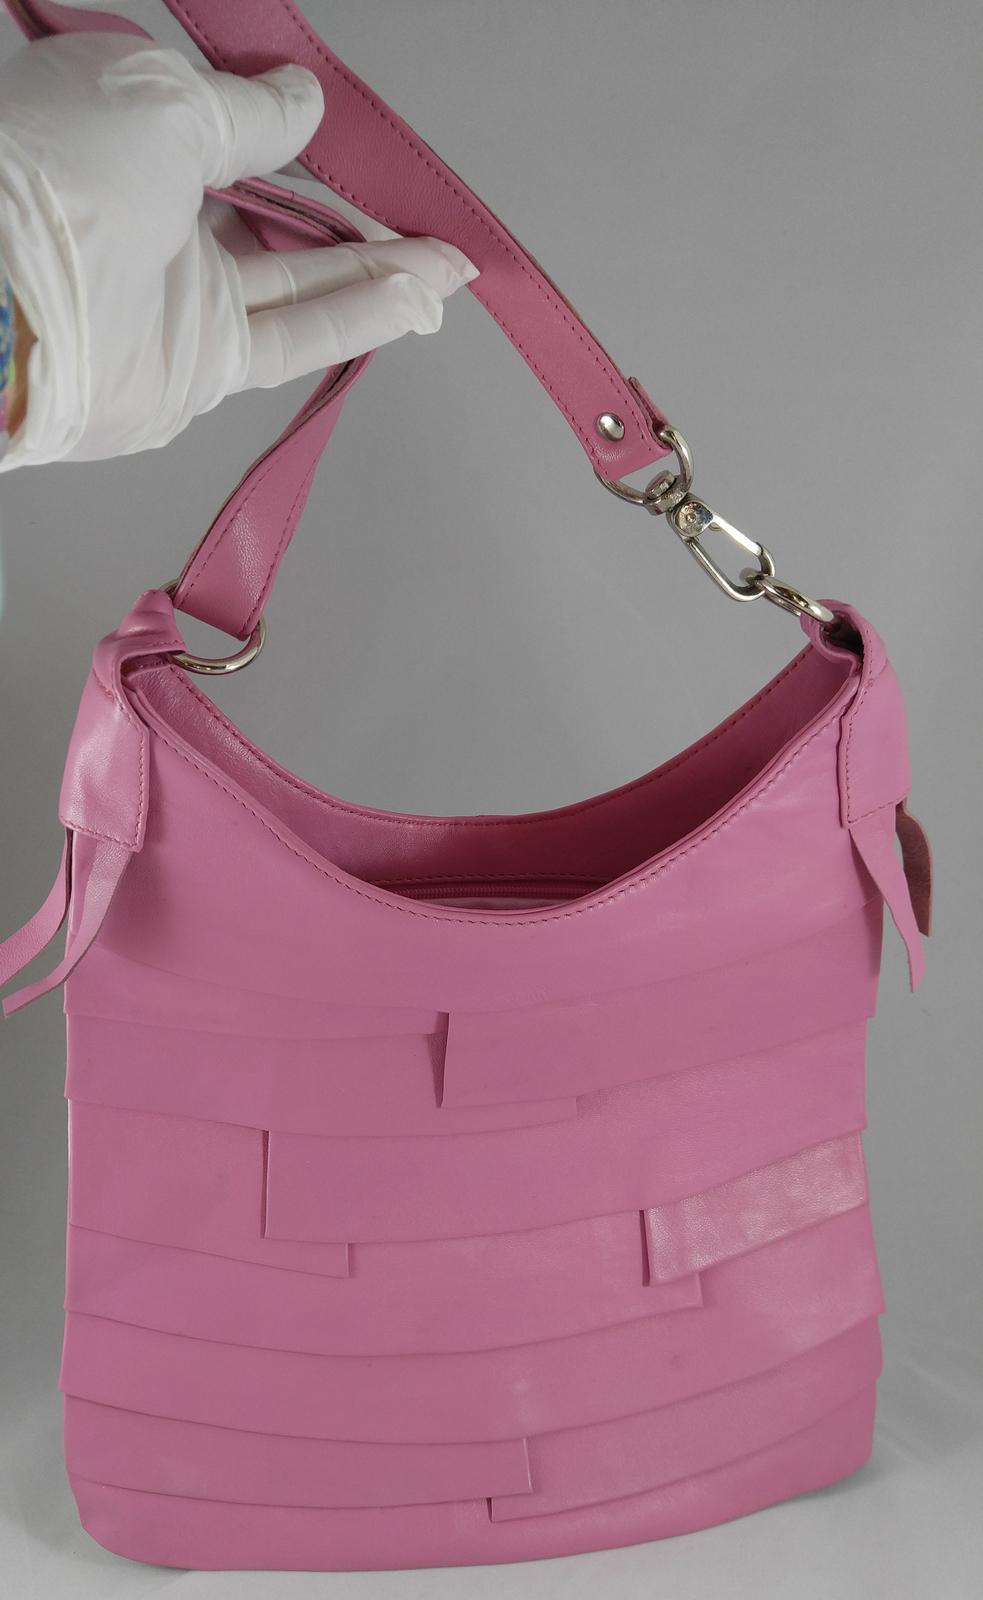 Kyss Handbags Designer Krista Orr Pink Shoulder Strap Purse Plymouth, Michigan image 12